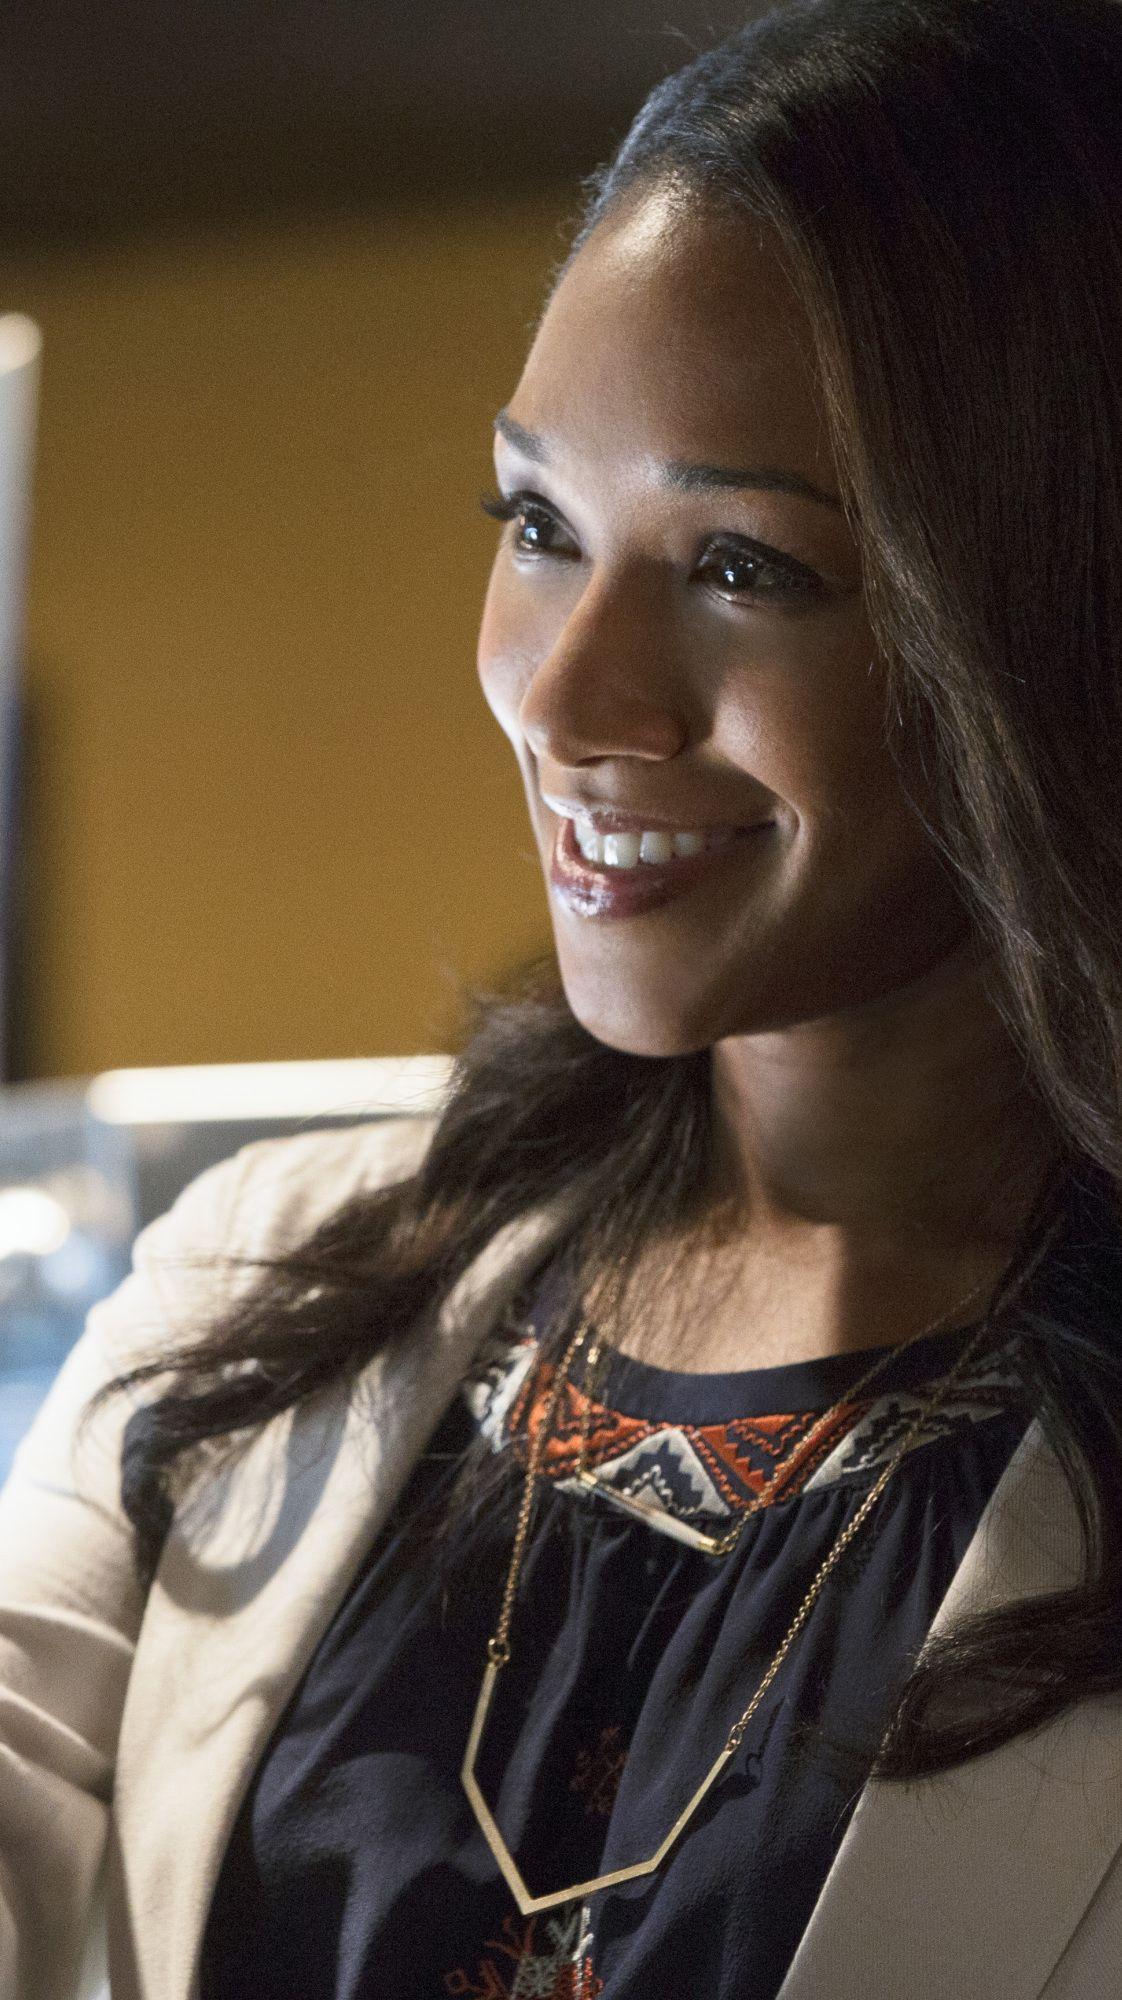 The Flash - 1x05 - Iris West